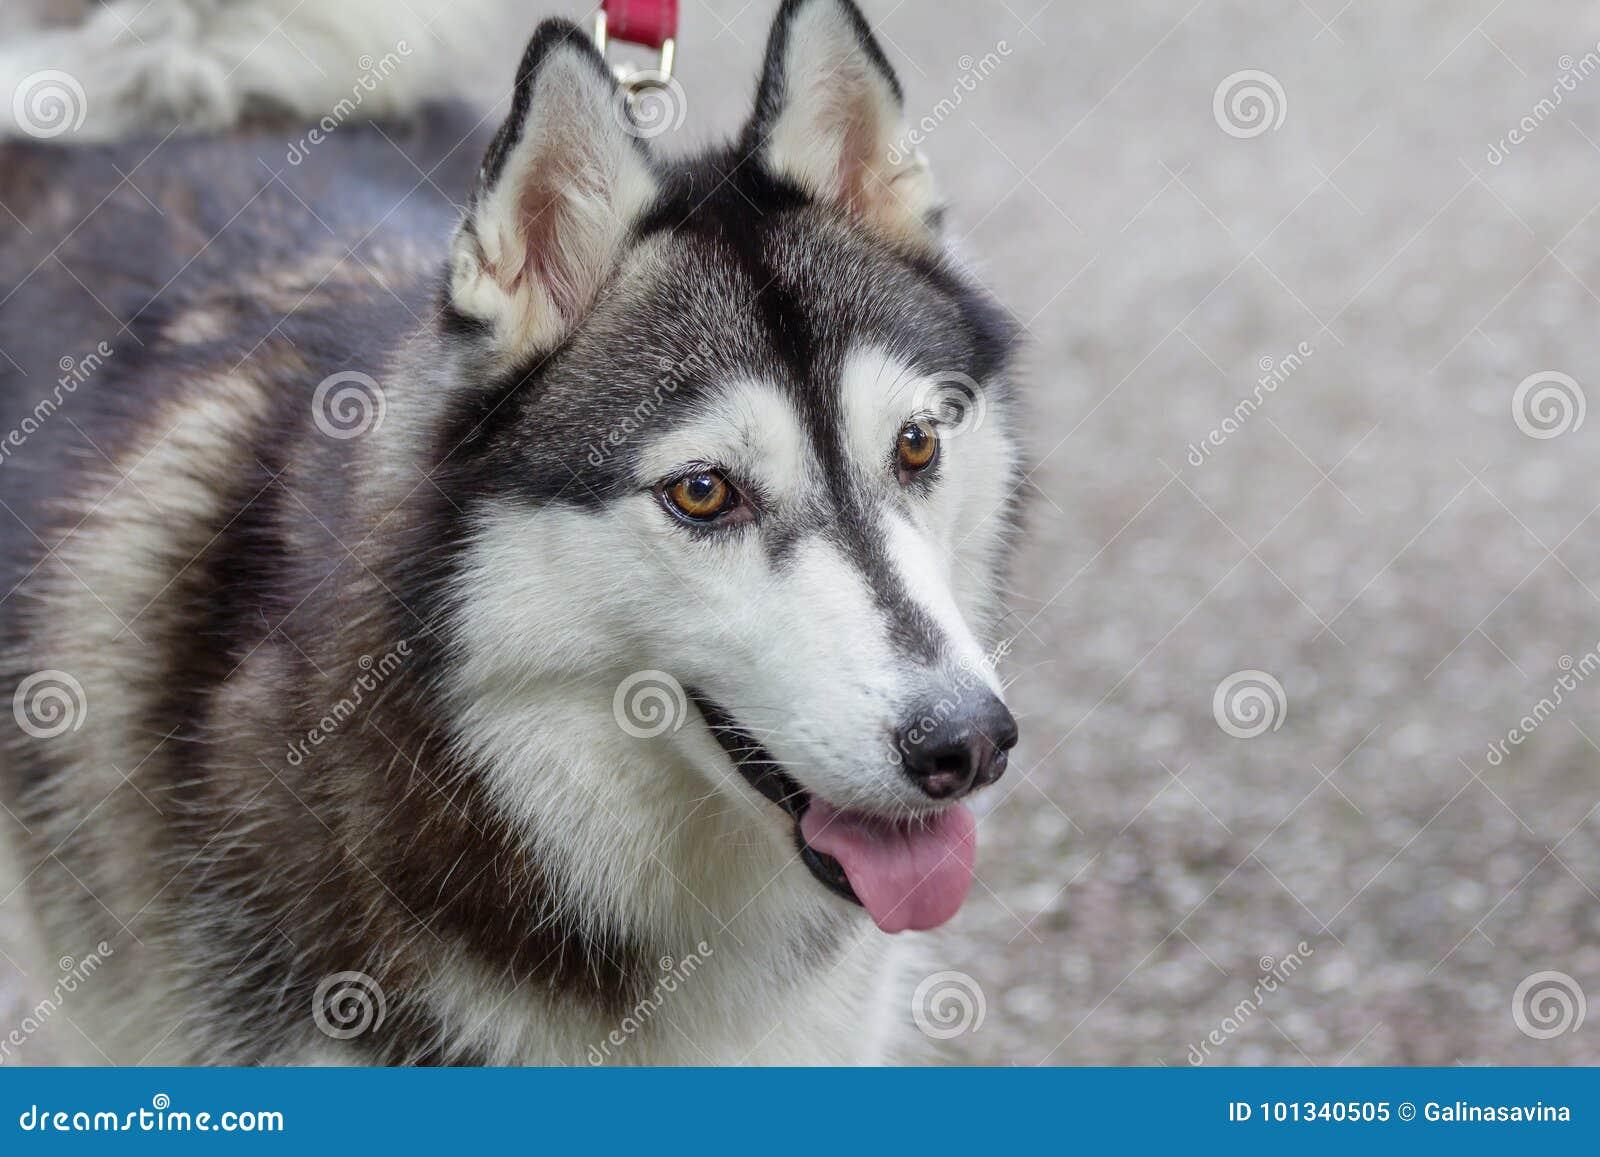 Perro Husky Alaskan Malamute